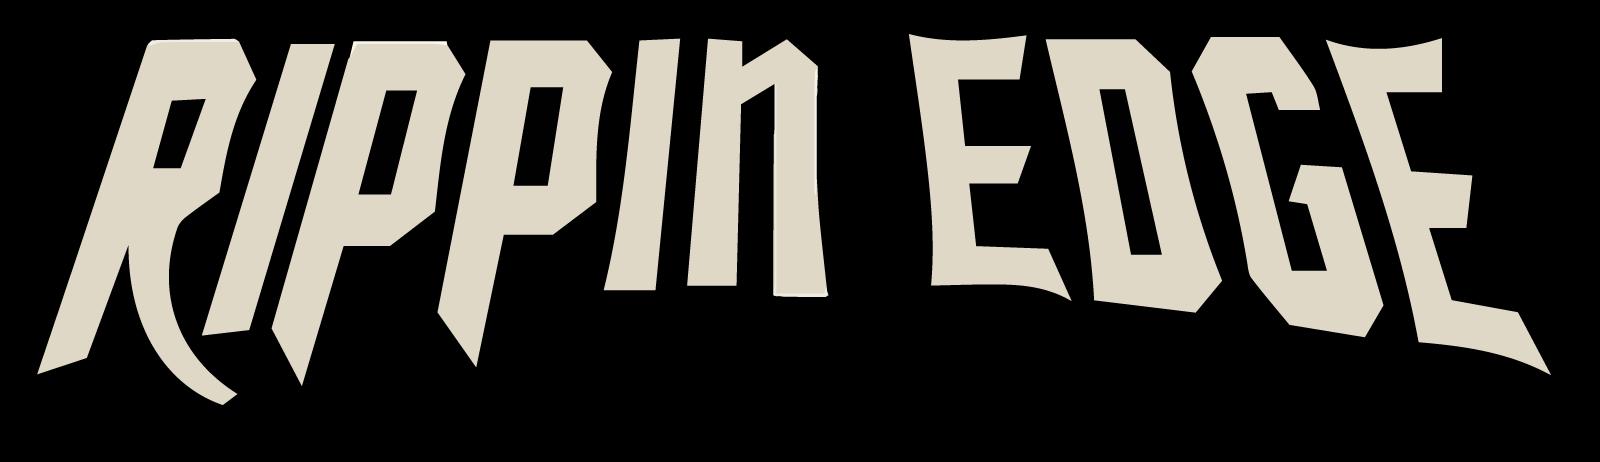 Rippin Edge Hydrovac Services Inc. logo